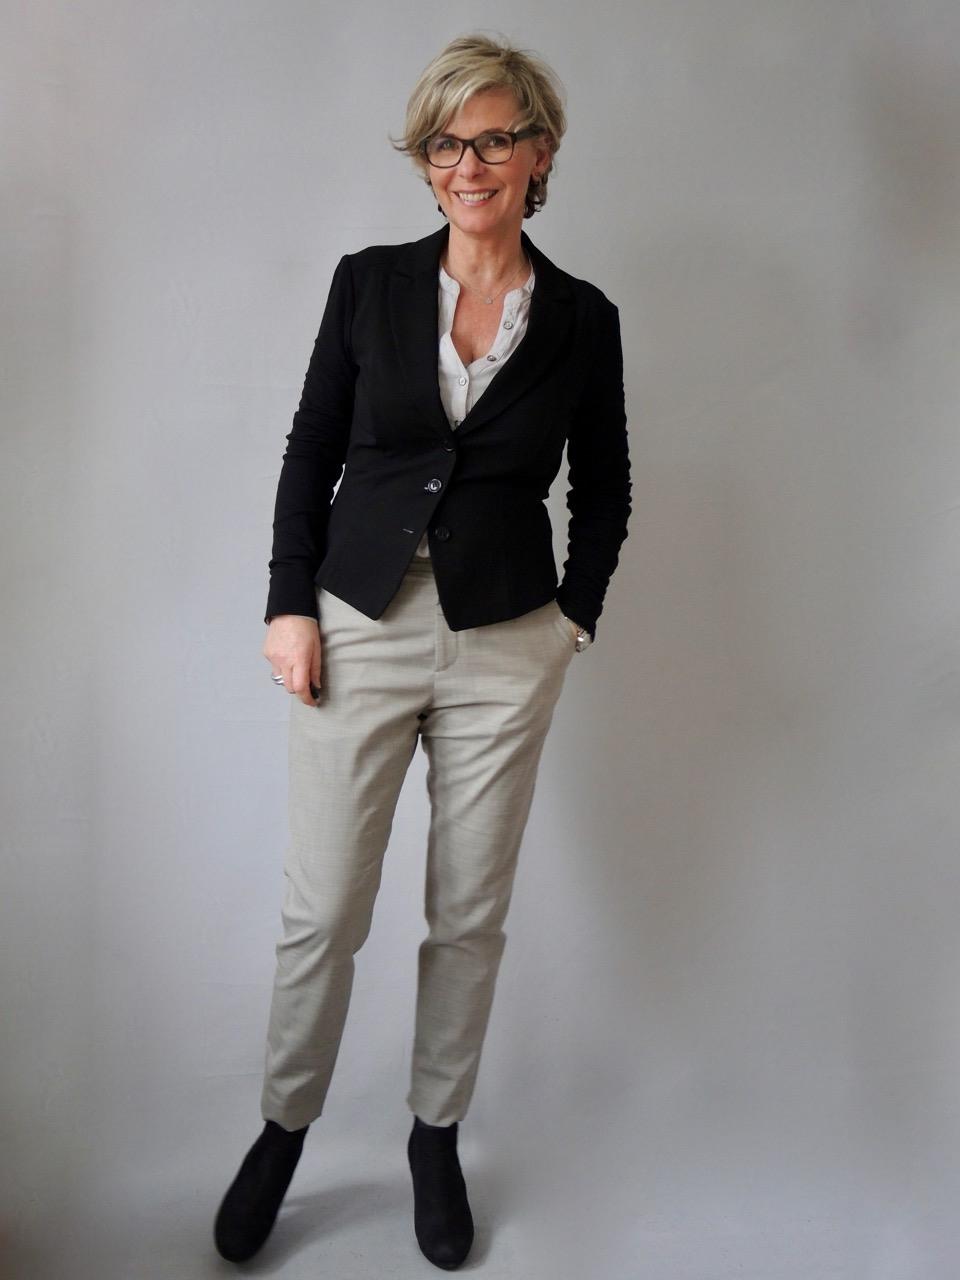 Kaffeepause Alltagstaugliche Büro  Outfits  Women2Style